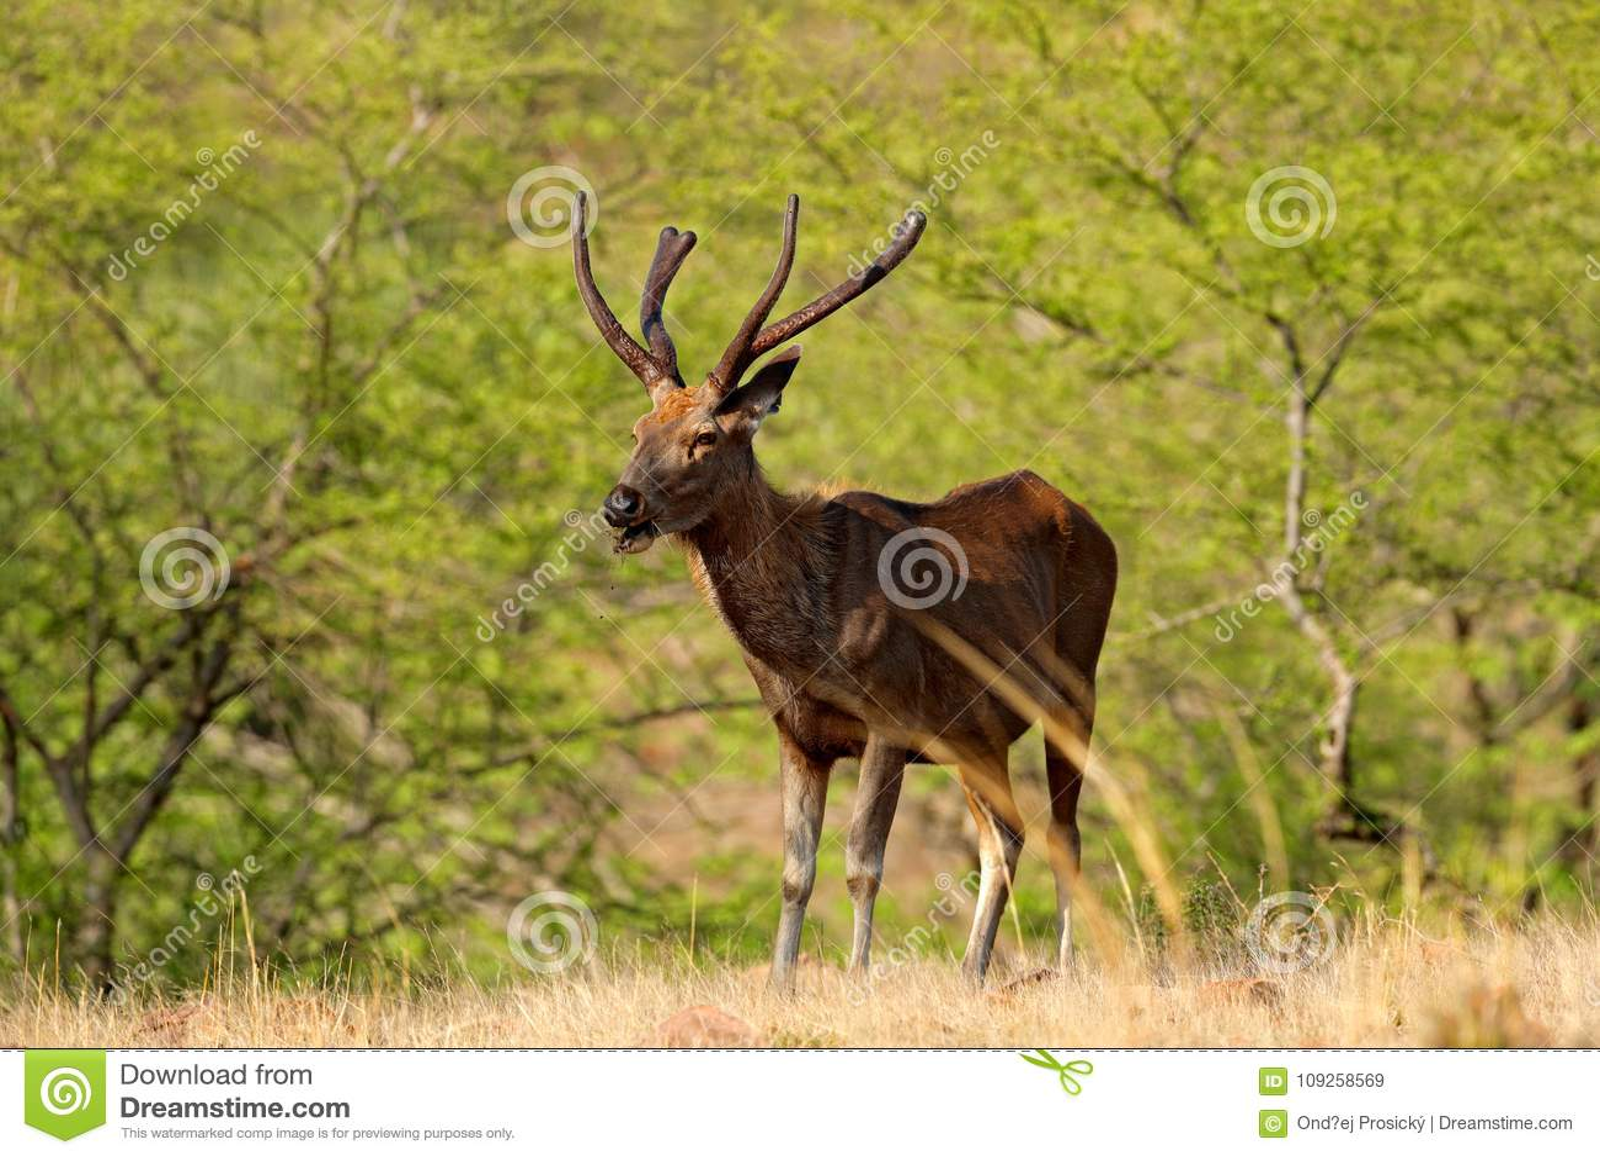 Cerfs communs de Sambar, Rusa unicolore, grand animal, sous-continent indien, Rathambore, Inde Cerfs communs, habitat de nature S